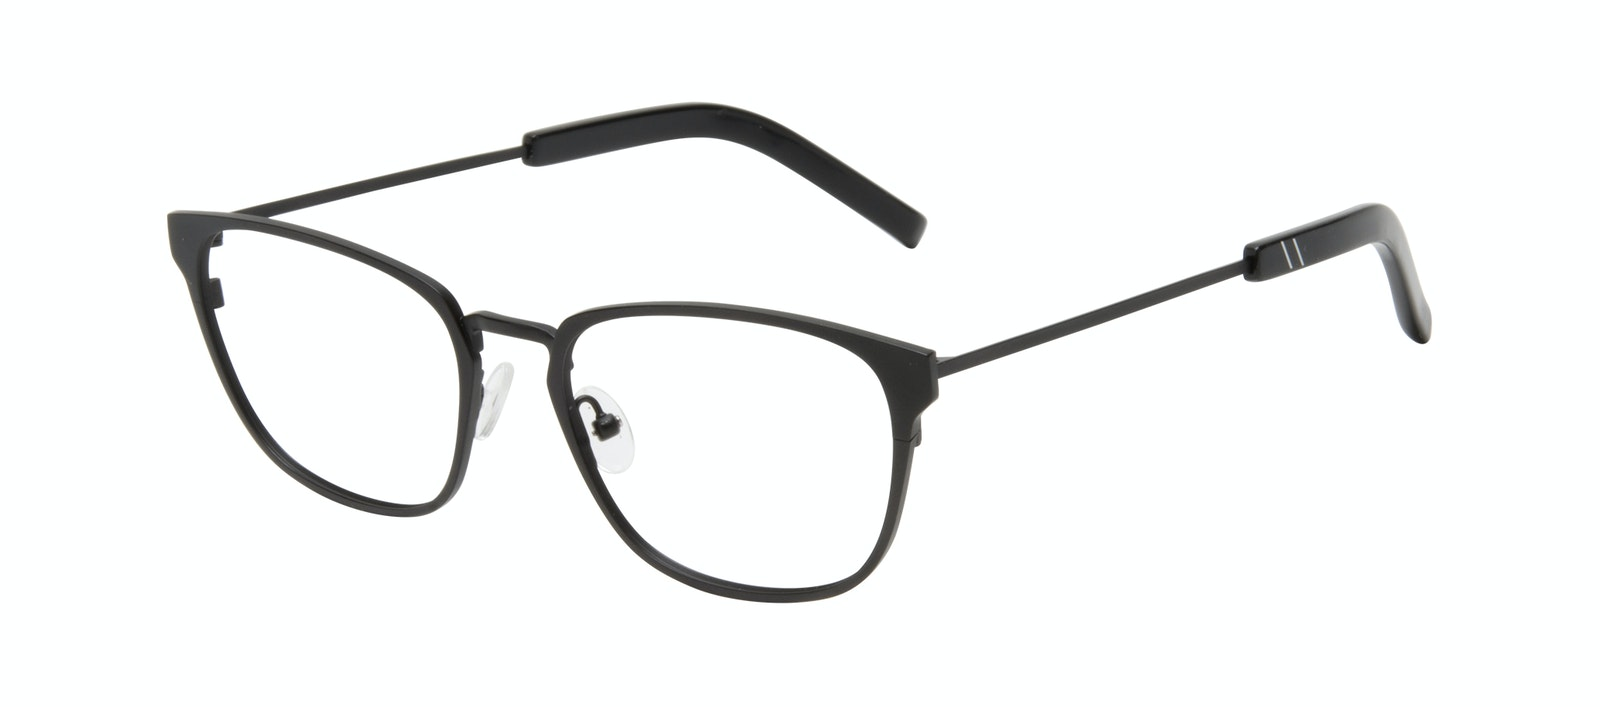 Affordable Fashion Glasses Square Eyeglasses Men Flex Onyx Matte Tilt